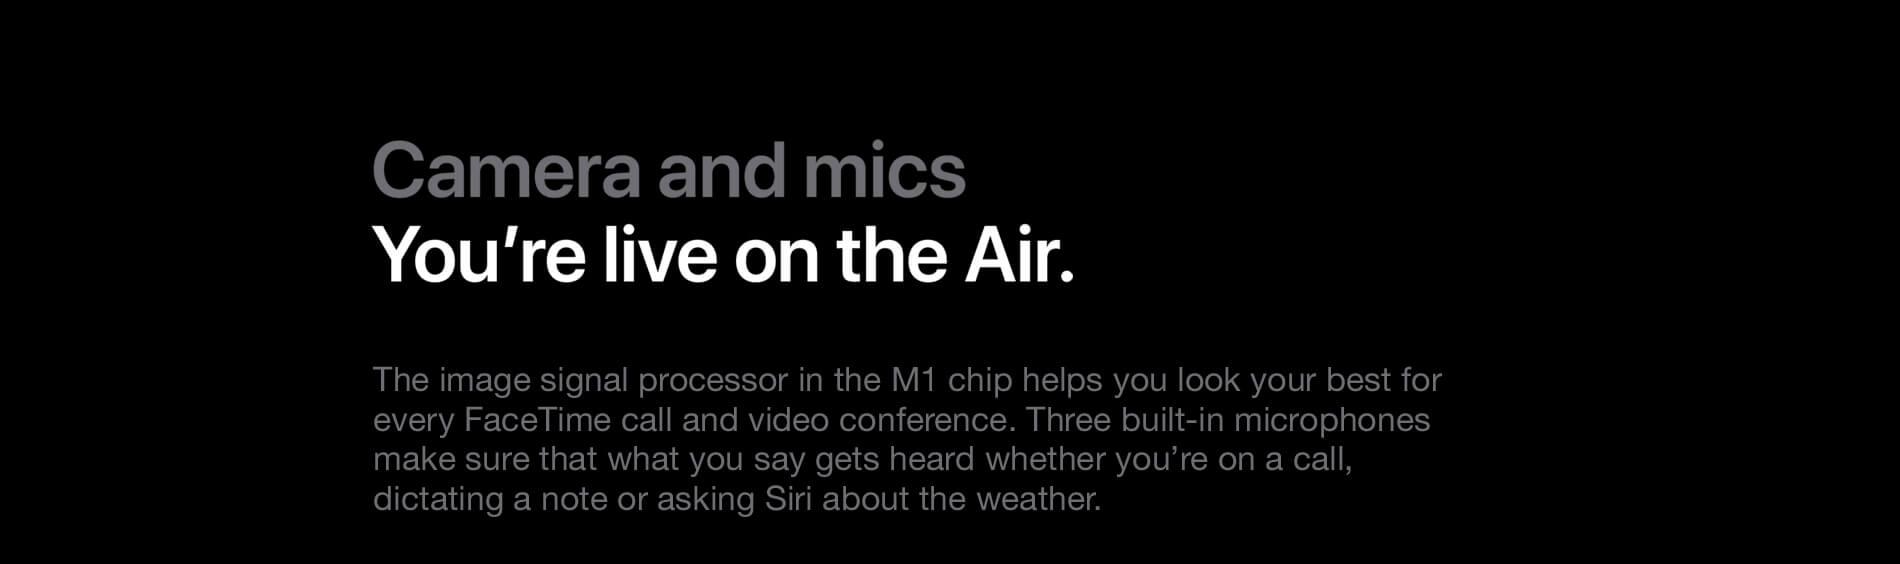 MacBook Air. Power. It's in the air.